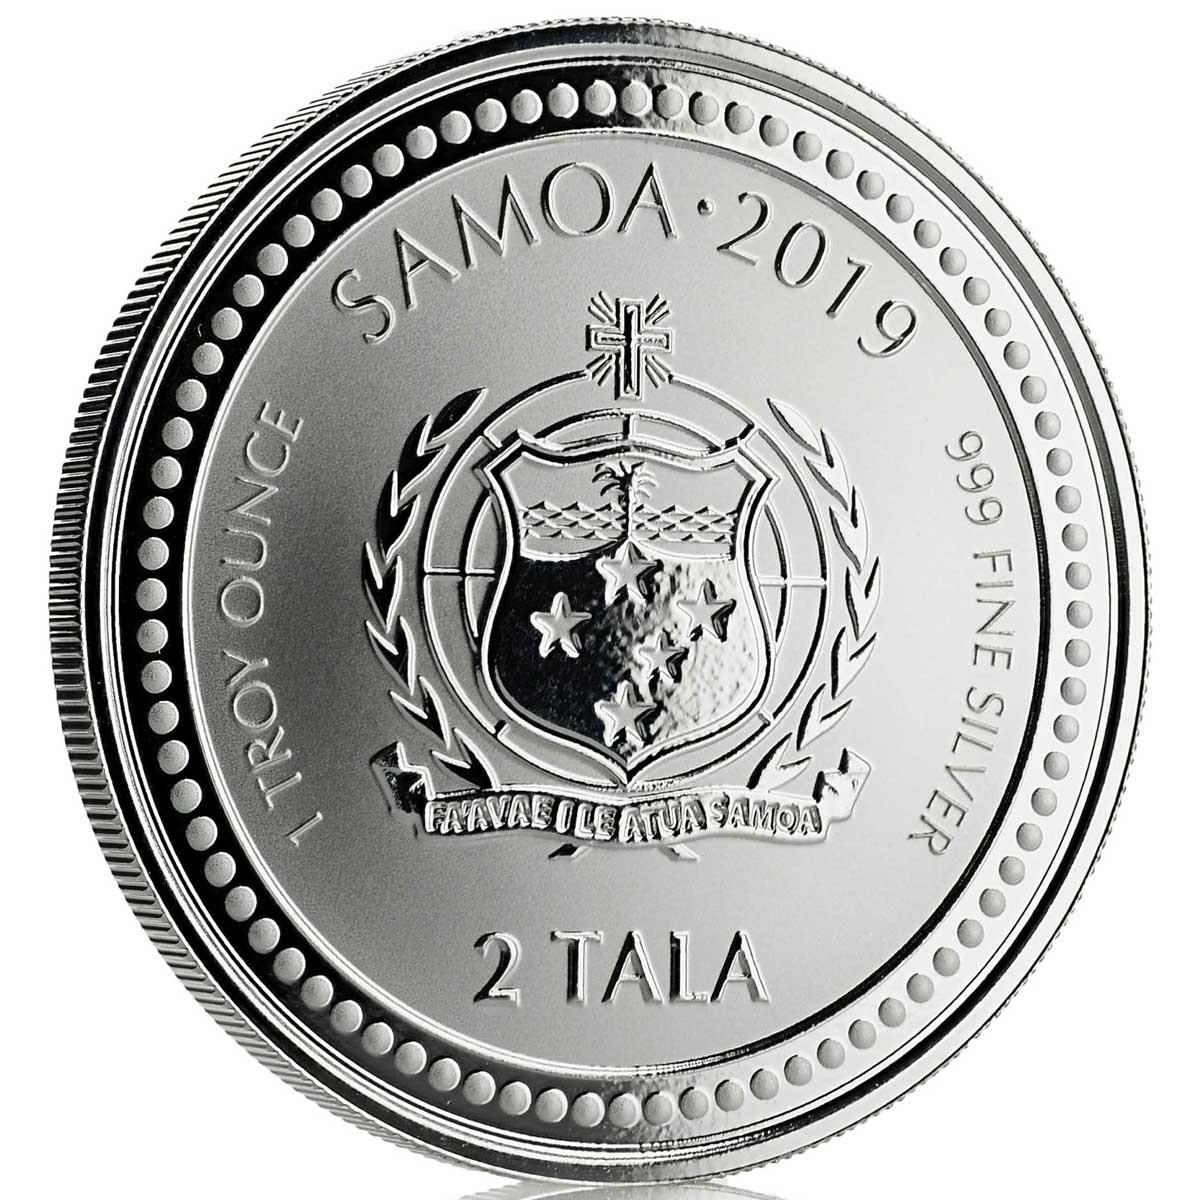 Самоа монета 2 тала Морской конек, BU, аверс